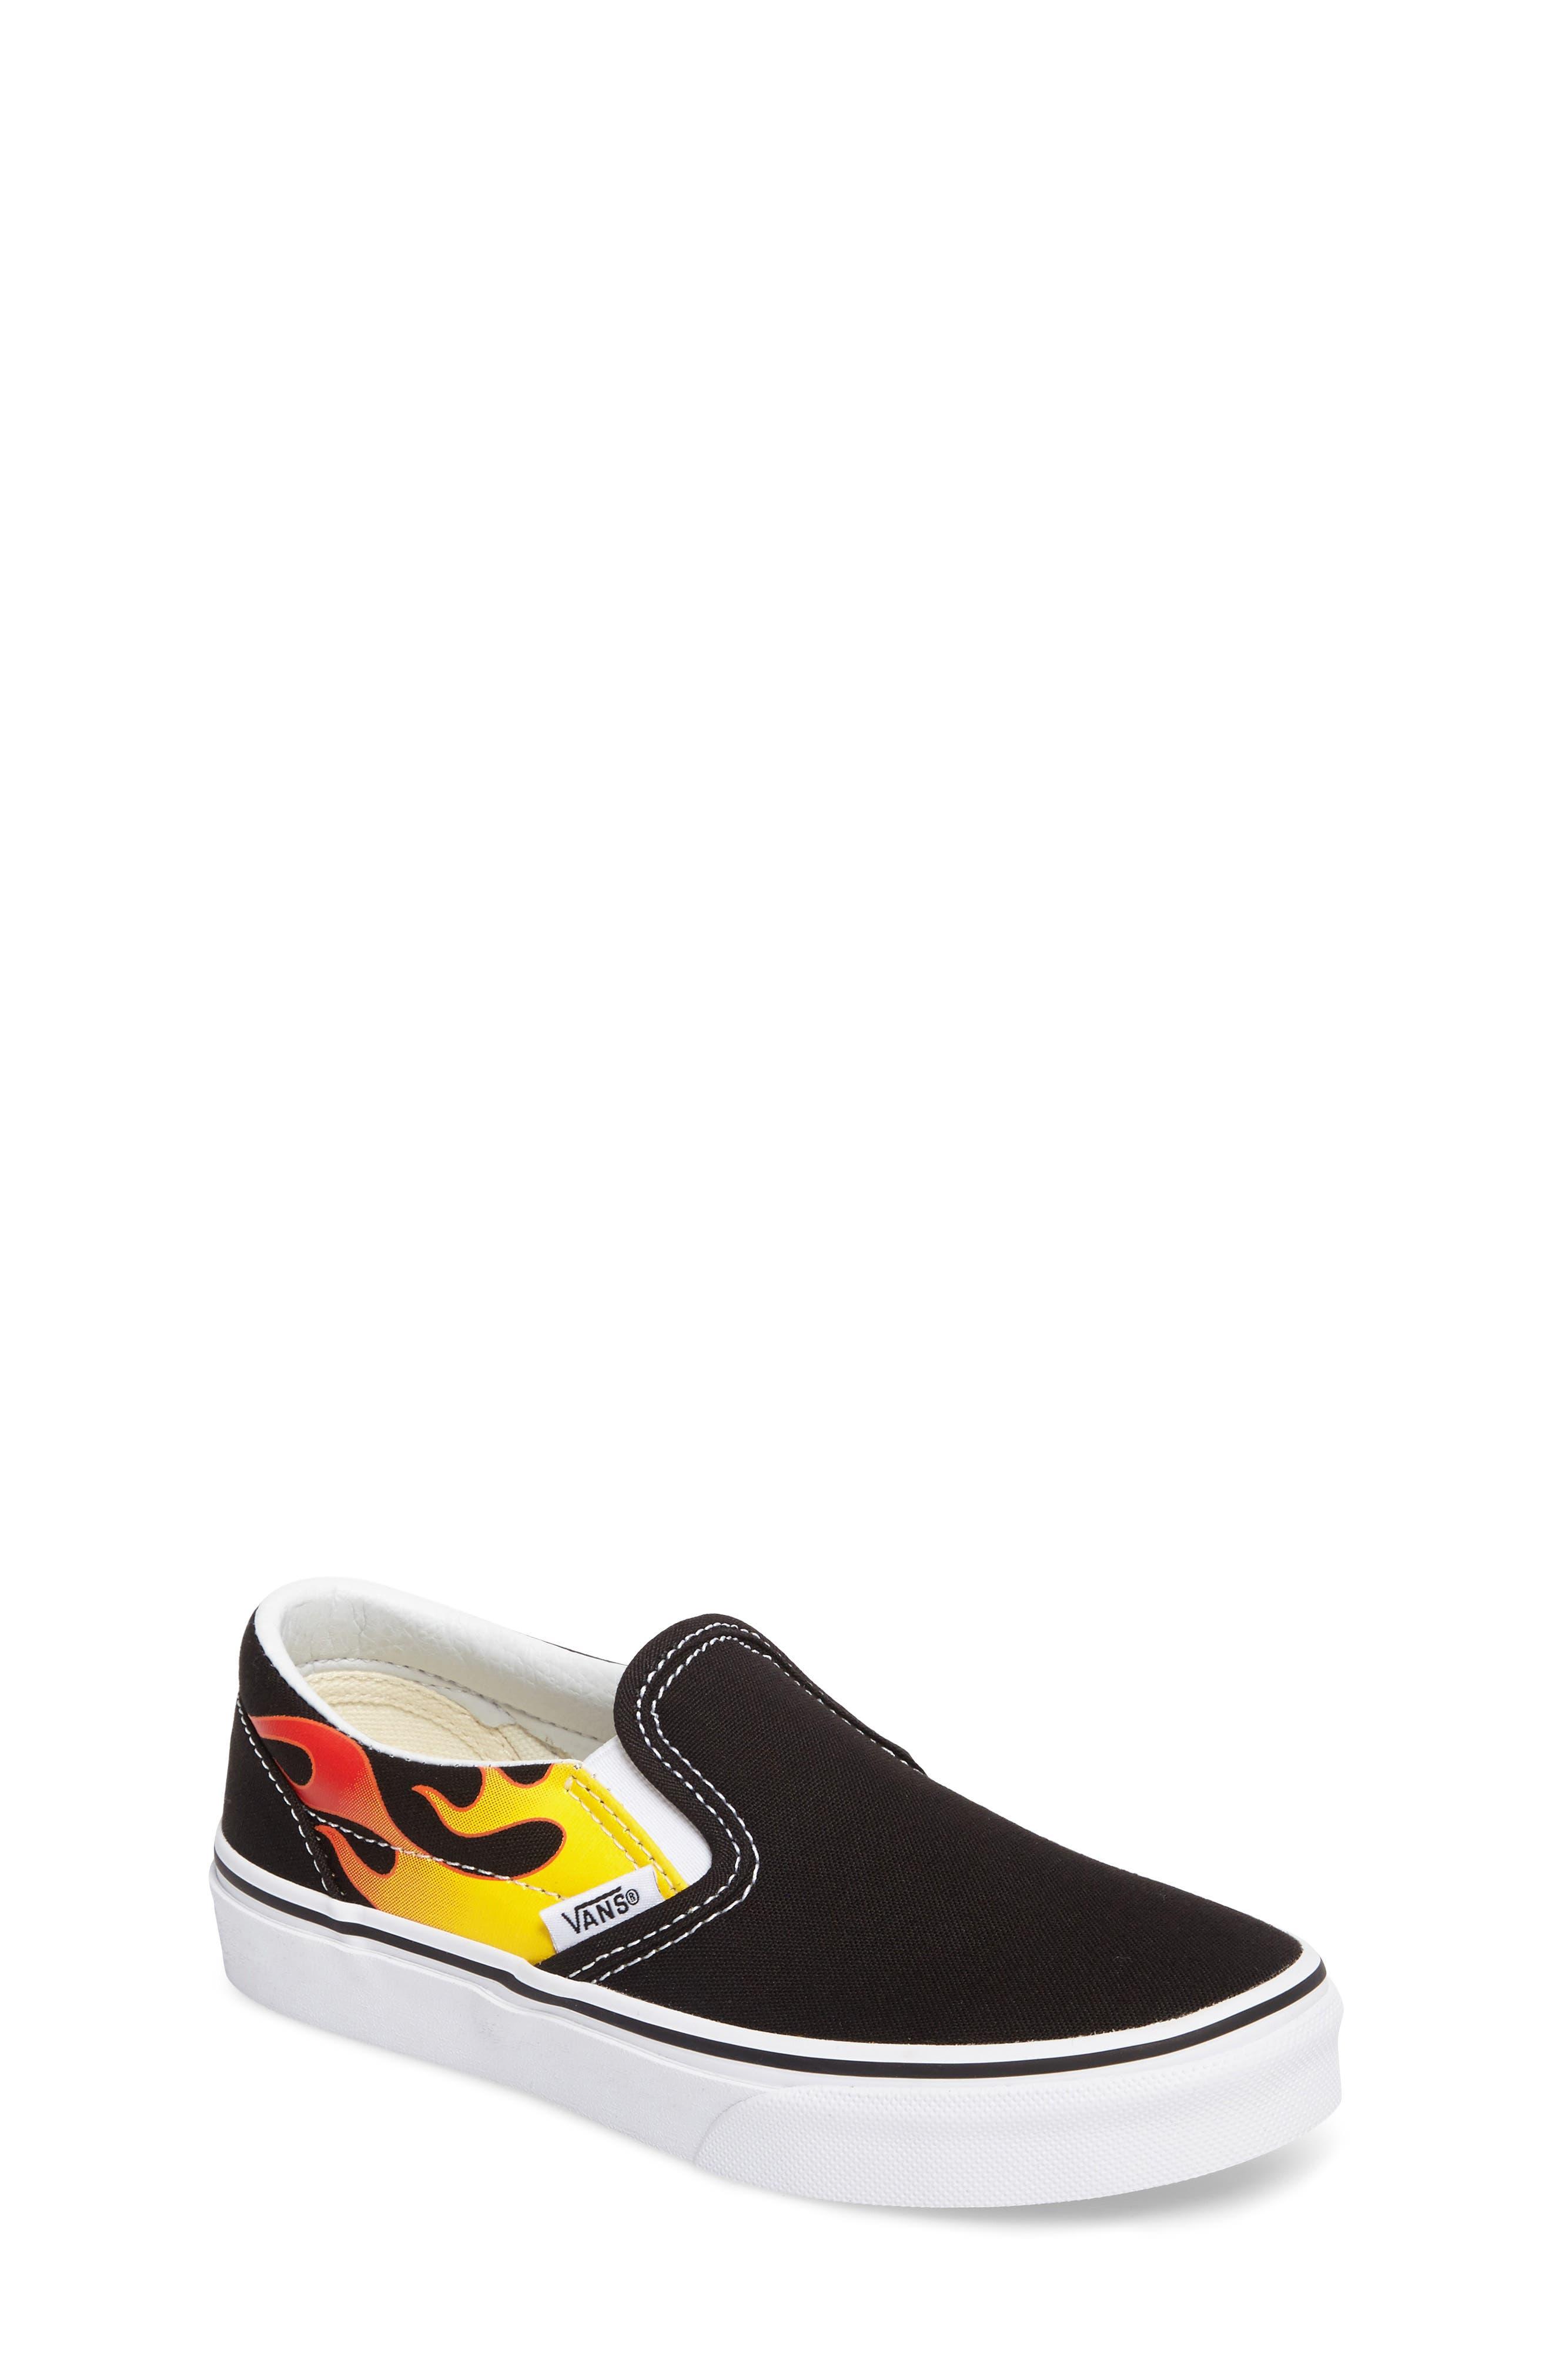 Main Image - Vans Flame Classic Slip-On Sneaker (Toddler, Little Kid & Big Kid)